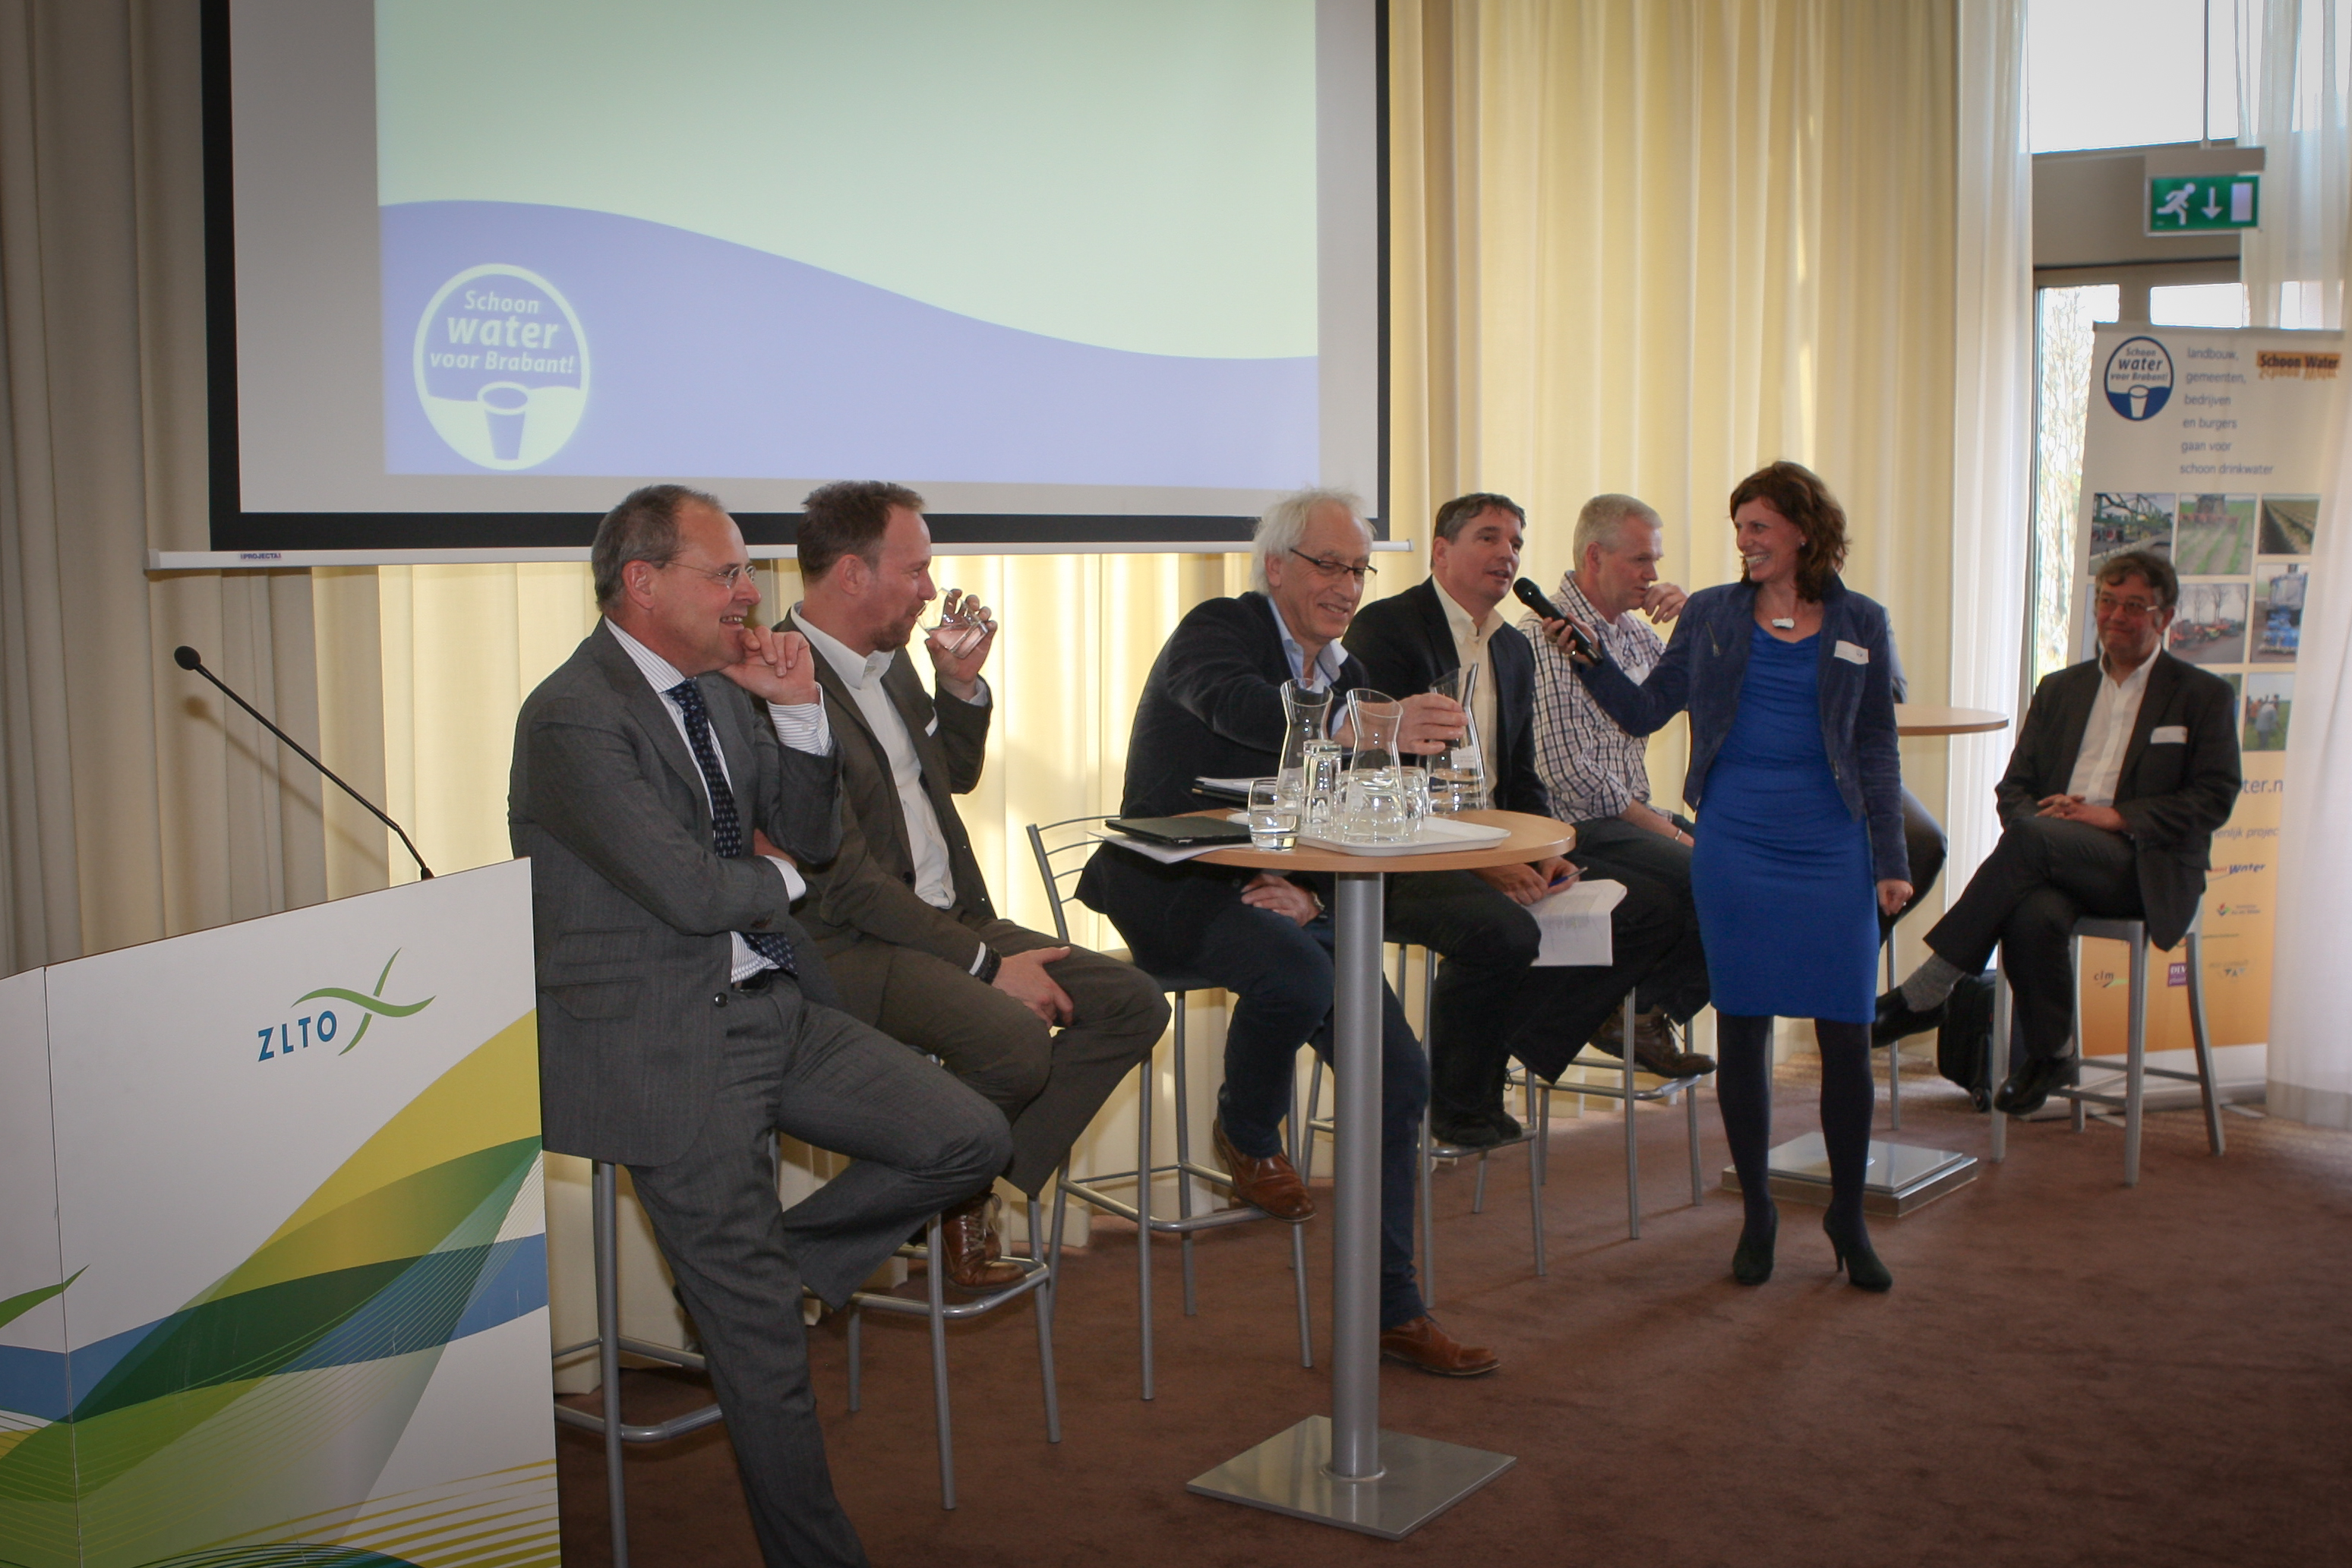 forumdiscussie onder leiding van Hanneke Koppers